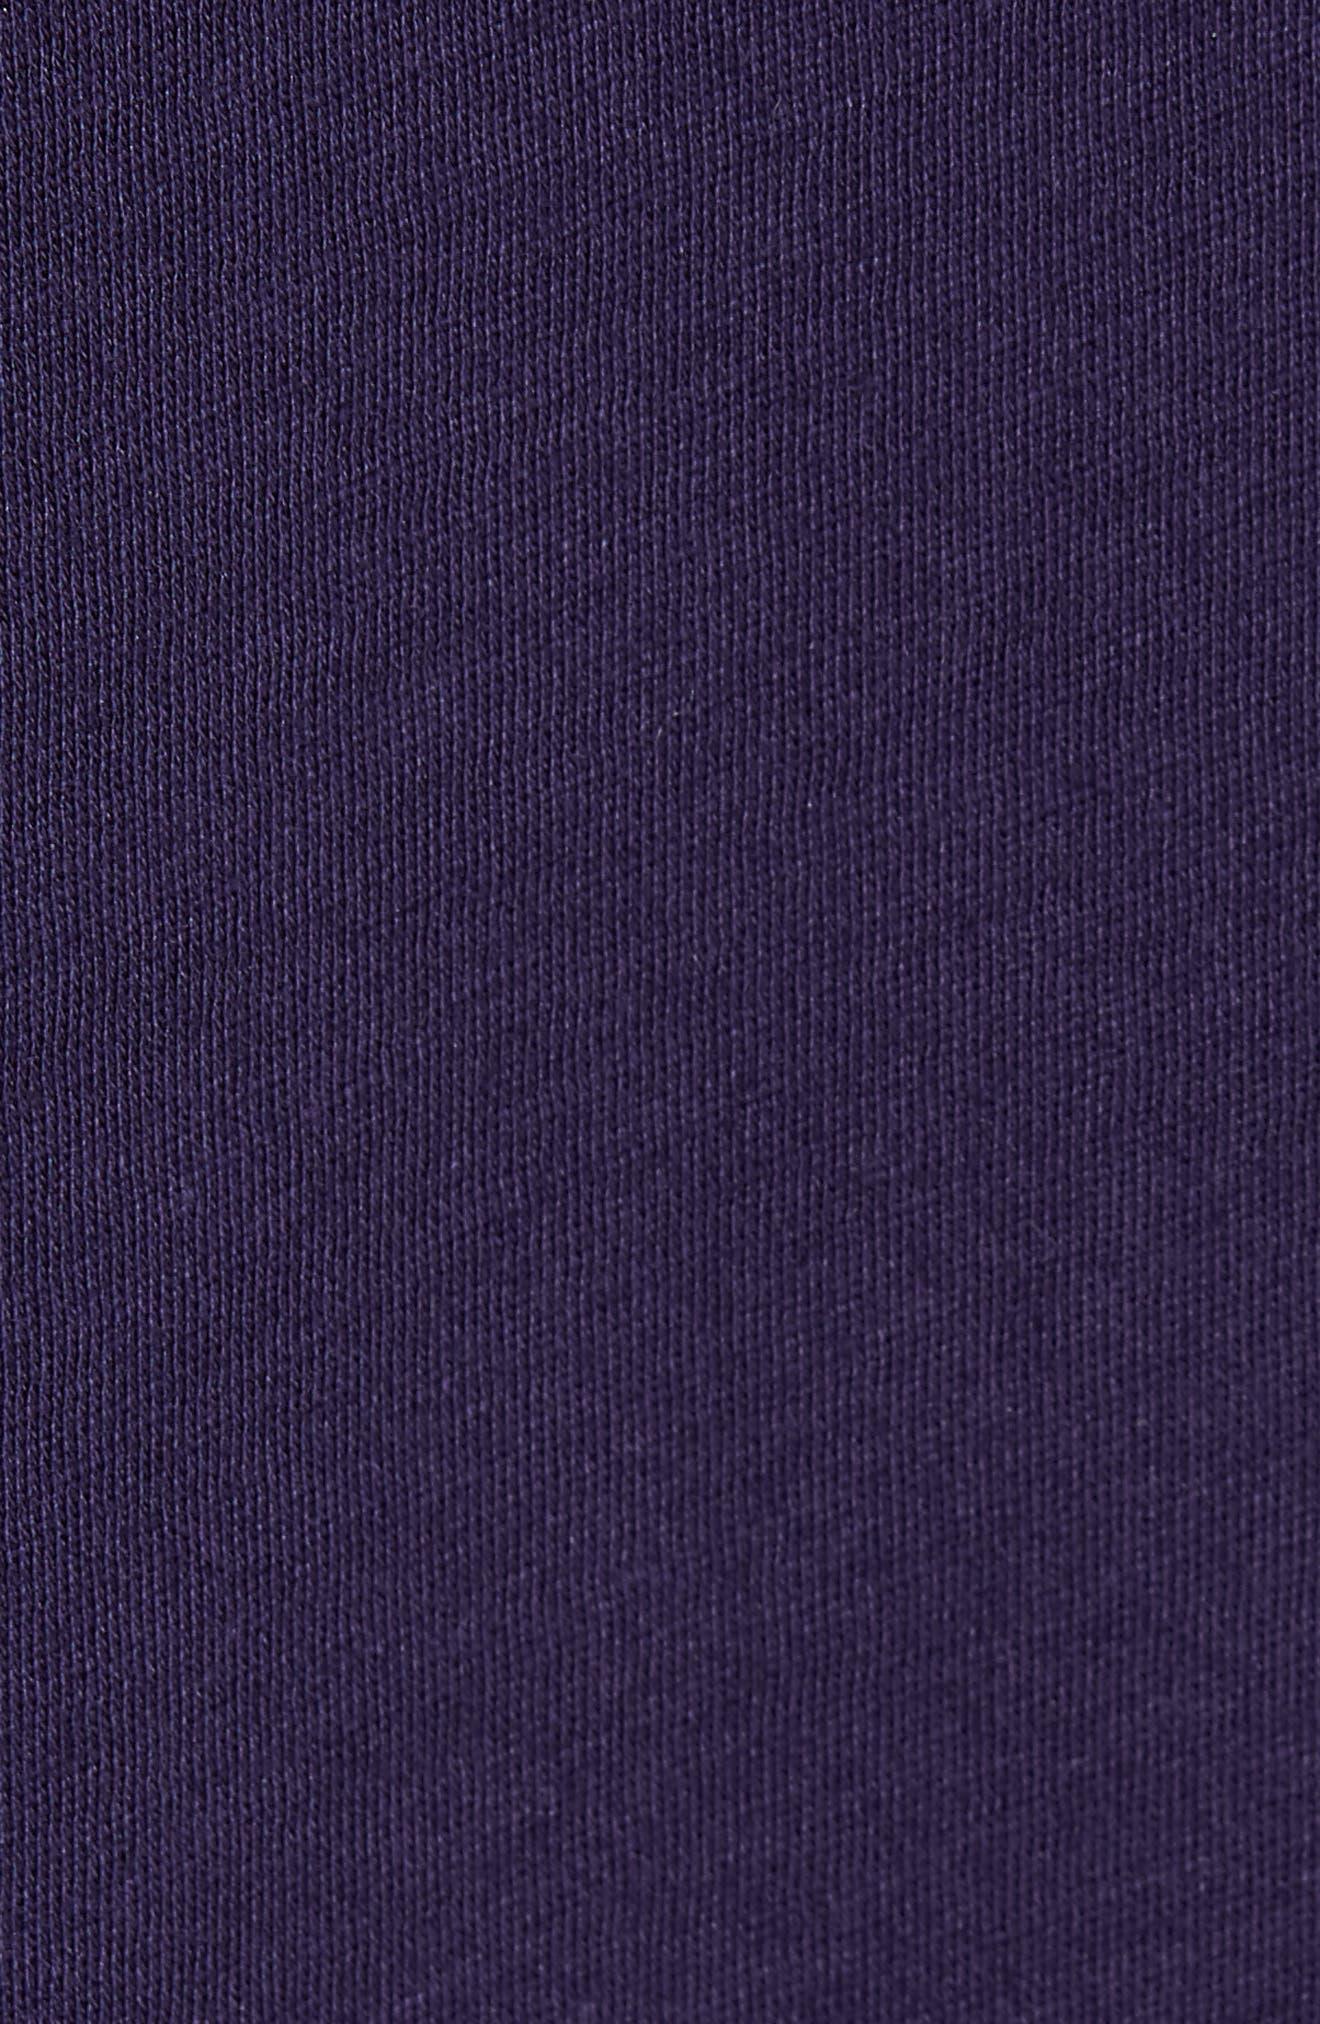 VINCE,                             Long Sleeve Pima Cotton Tee,                             Alternate thumbnail 5, color,                             501